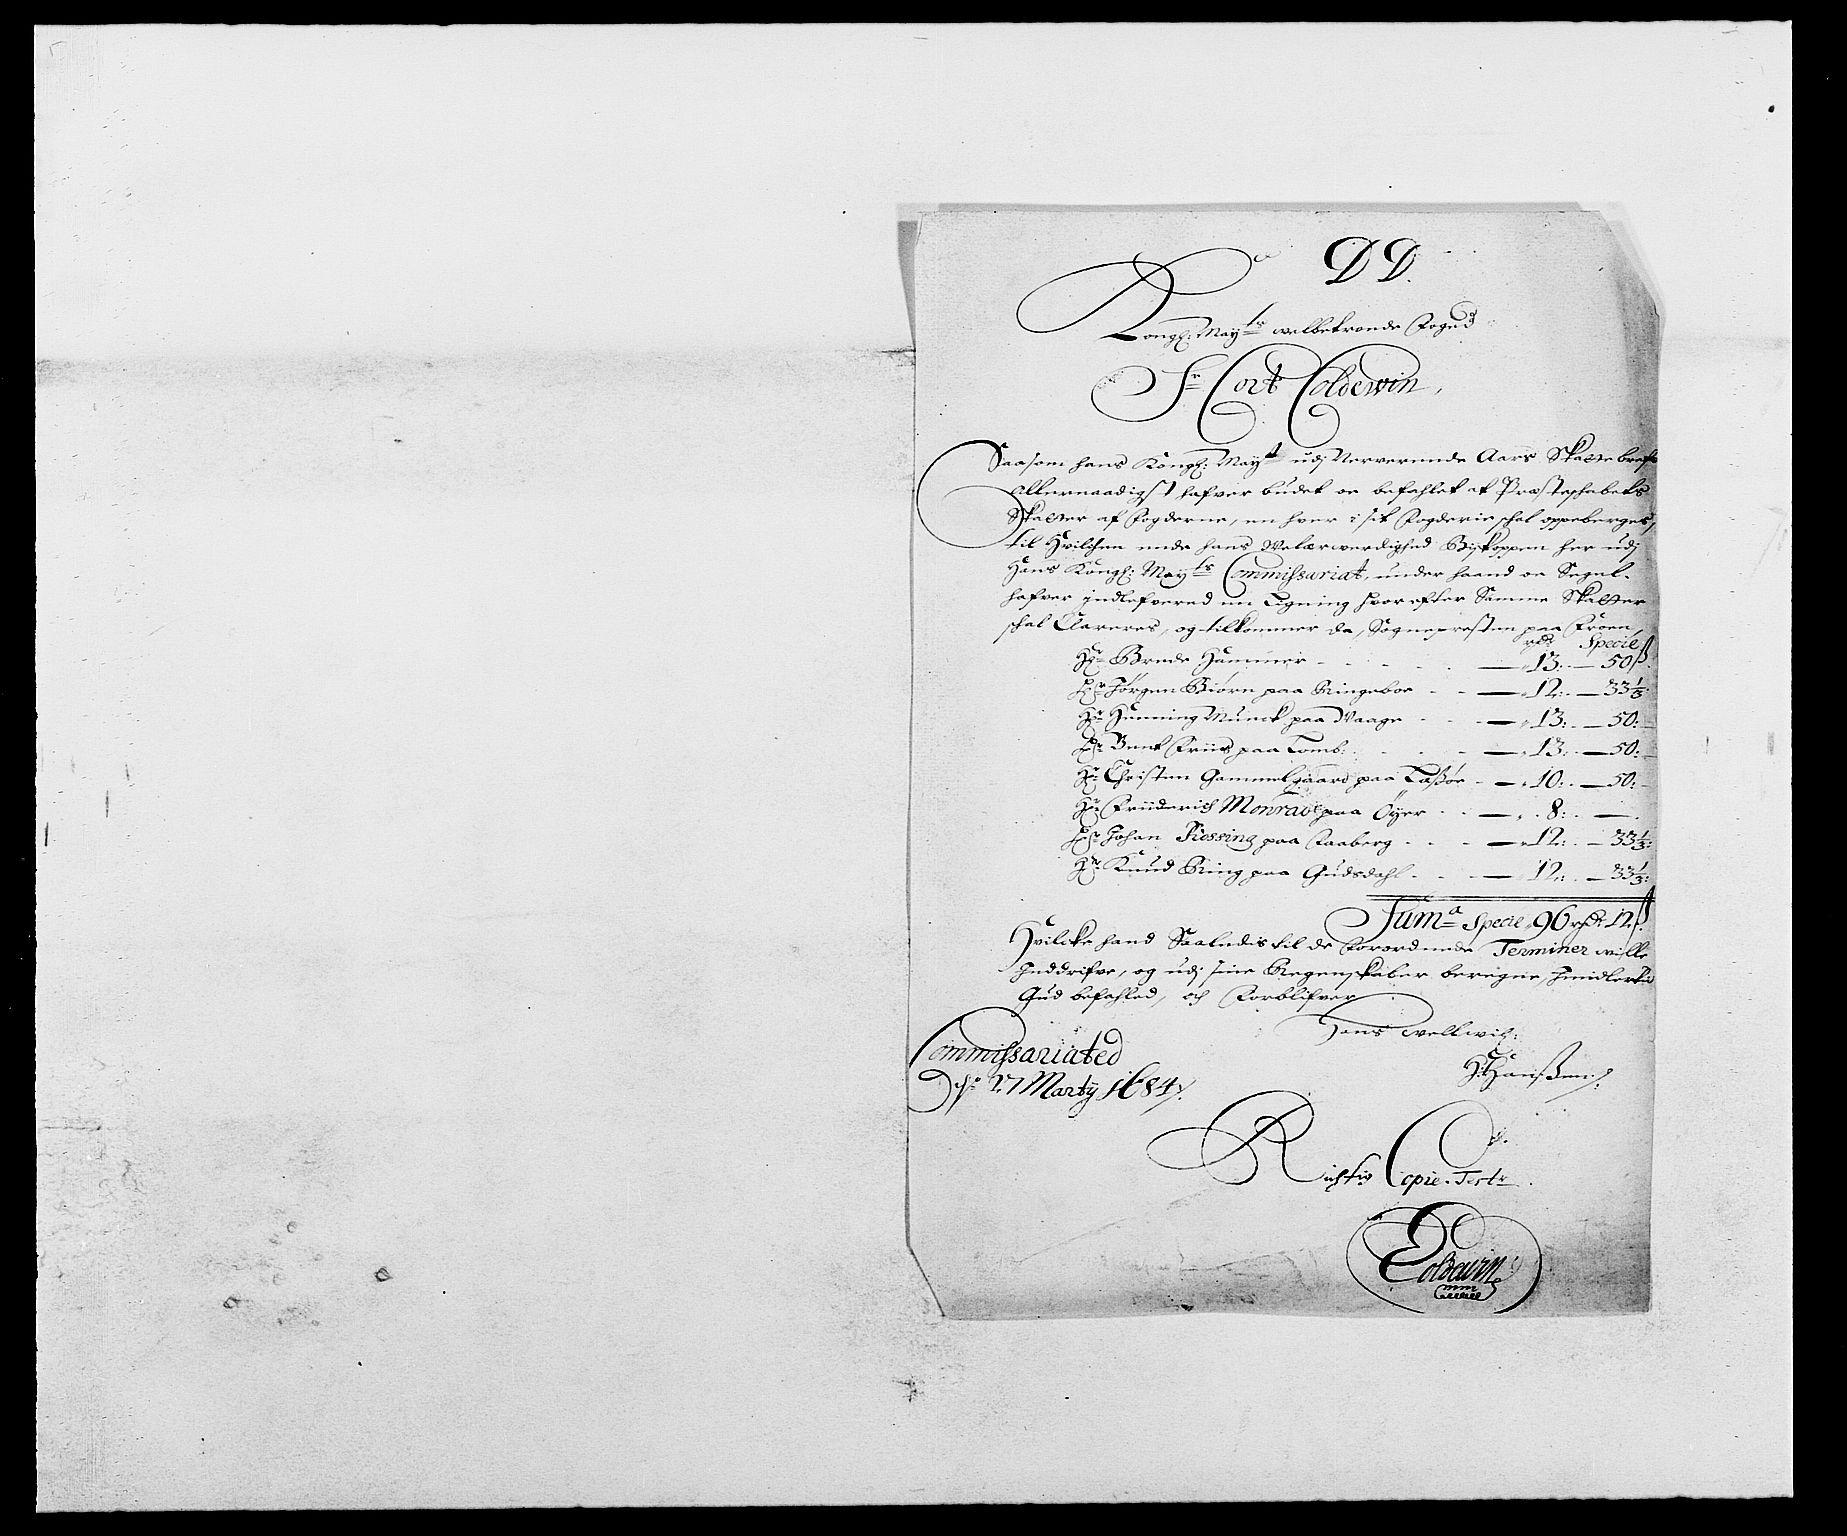 RA, Rentekammeret inntil 1814, Reviderte regnskaper, Fogderegnskap, R17/L1159: Fogderegnskap Gudbrandsdal, 1682-1689, s. 53